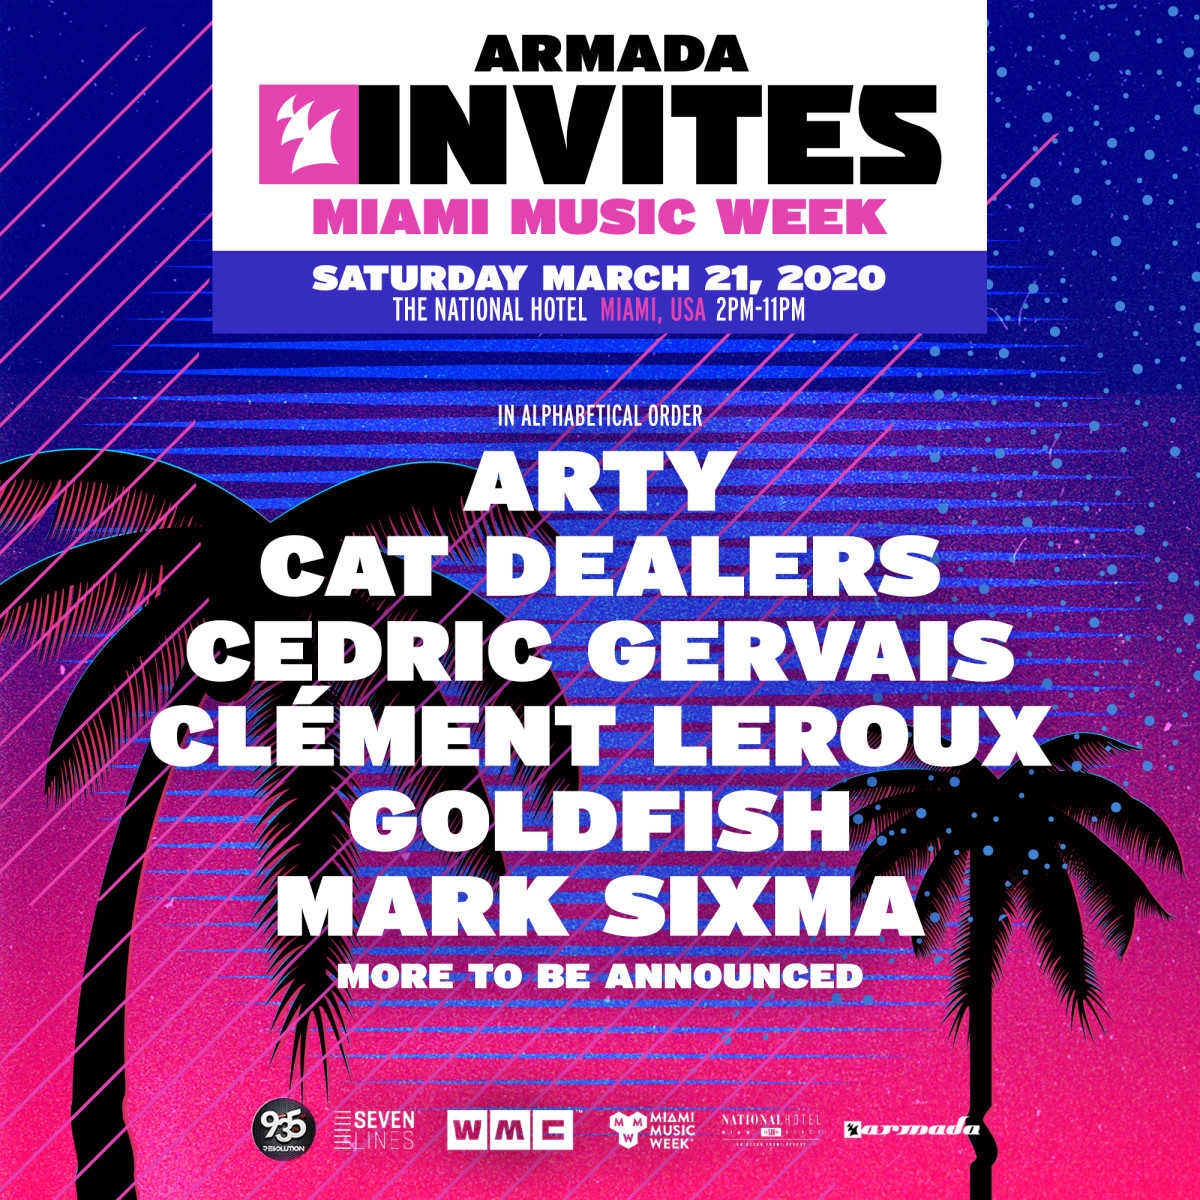 20200321_Armada_Invites_Miami_Music_Week_Lineup